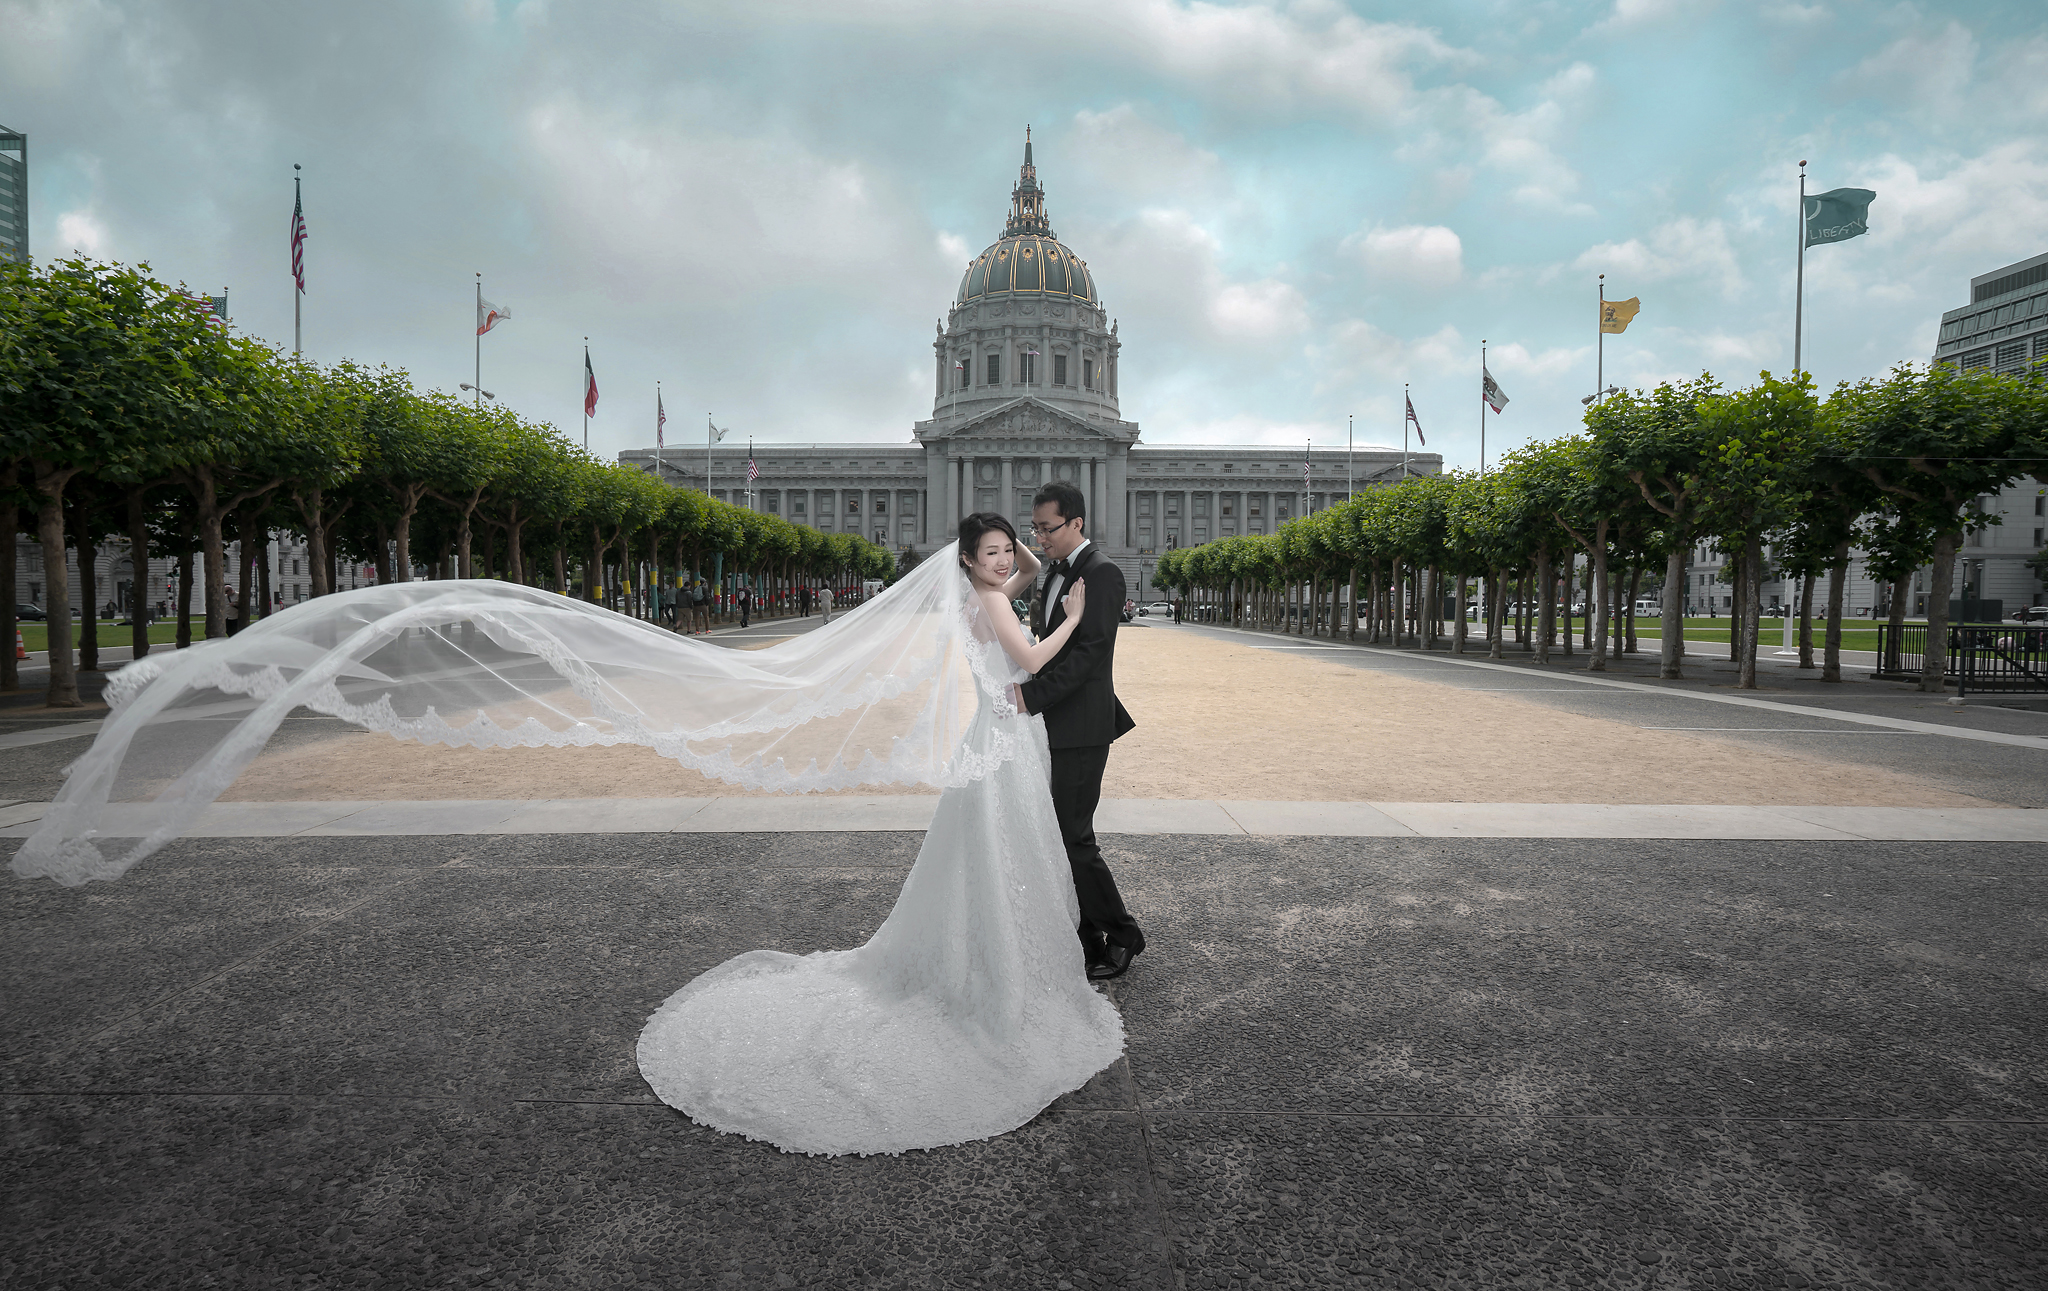 FEI AND WENHUI'S CITY HALL WEDDING